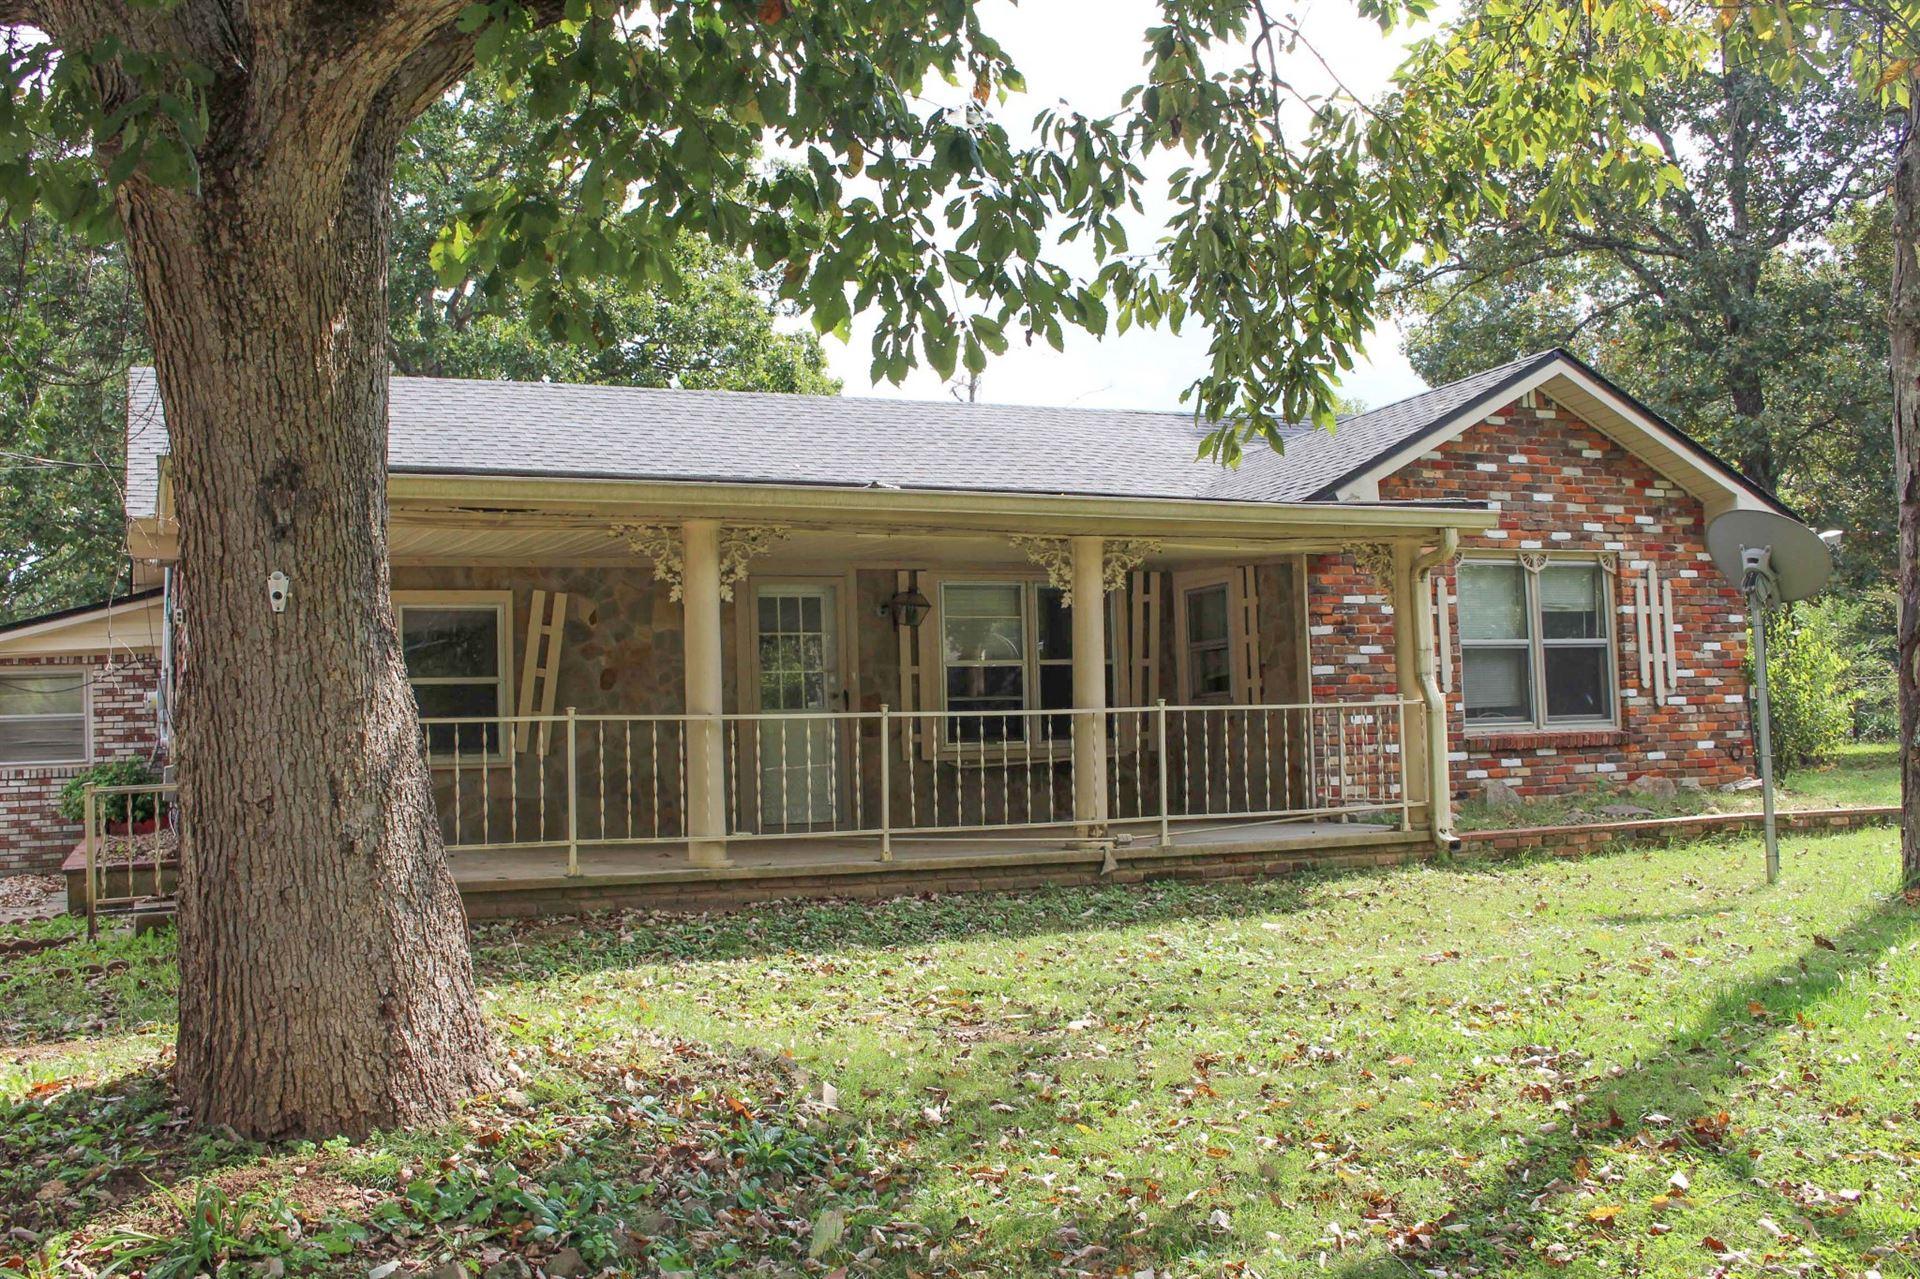 Photo of 409 Mount Herman Rd, Murfreesboro, TN 37127 (MLS # 2300449)